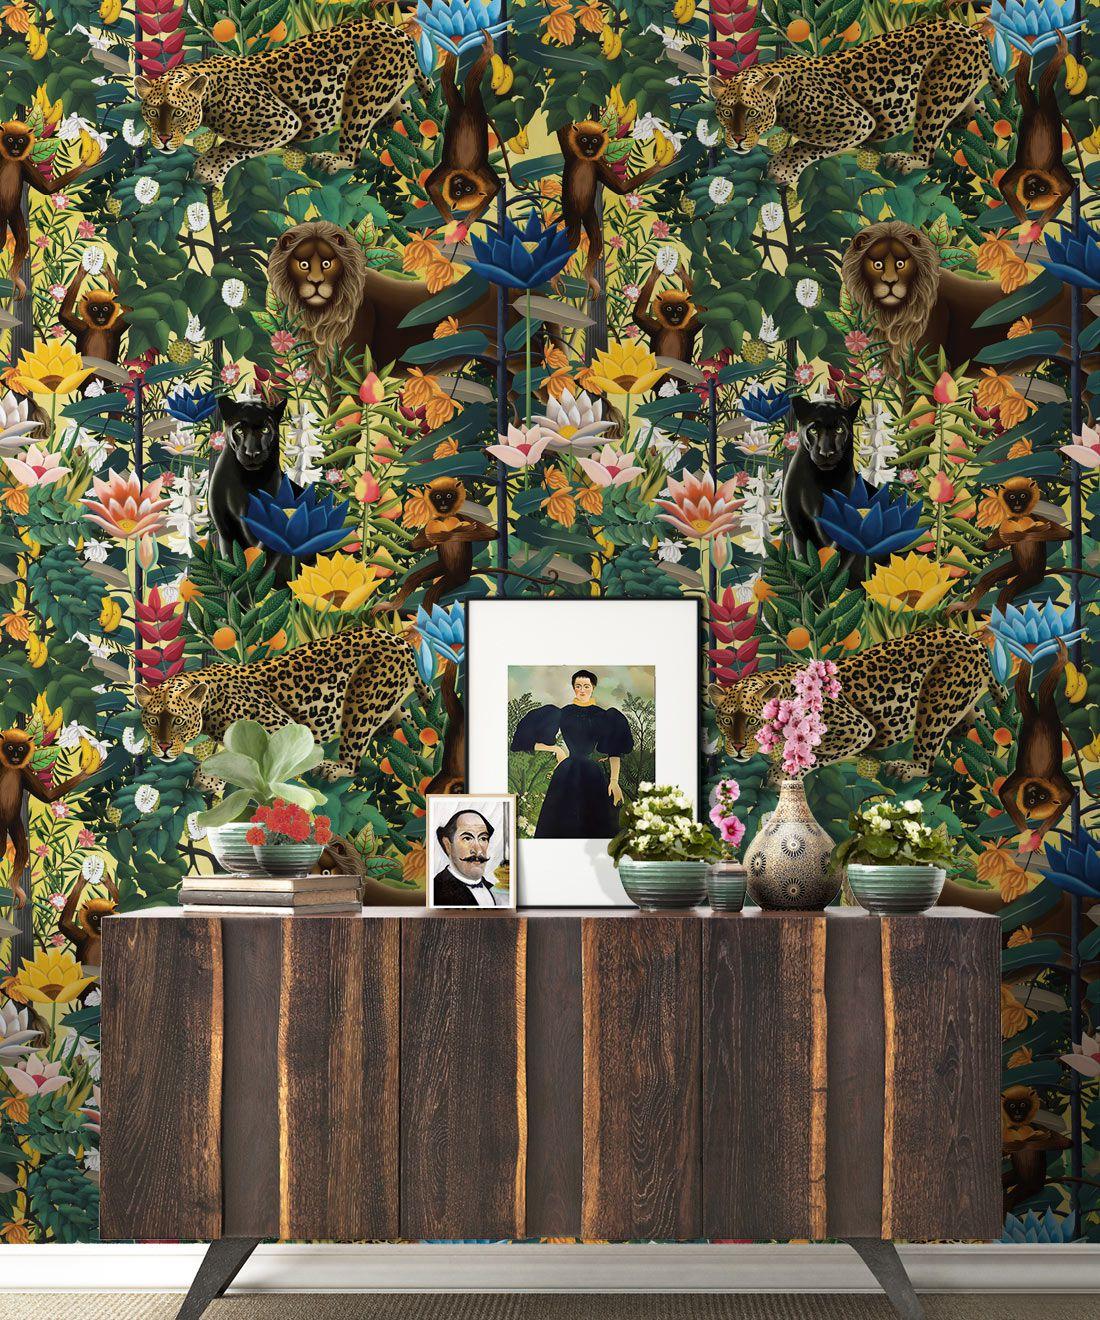 The Jungle Wallpaper • Animal Wallpaper • Botanical Wallpaper • Hazelwood Wallpaper • Insitu